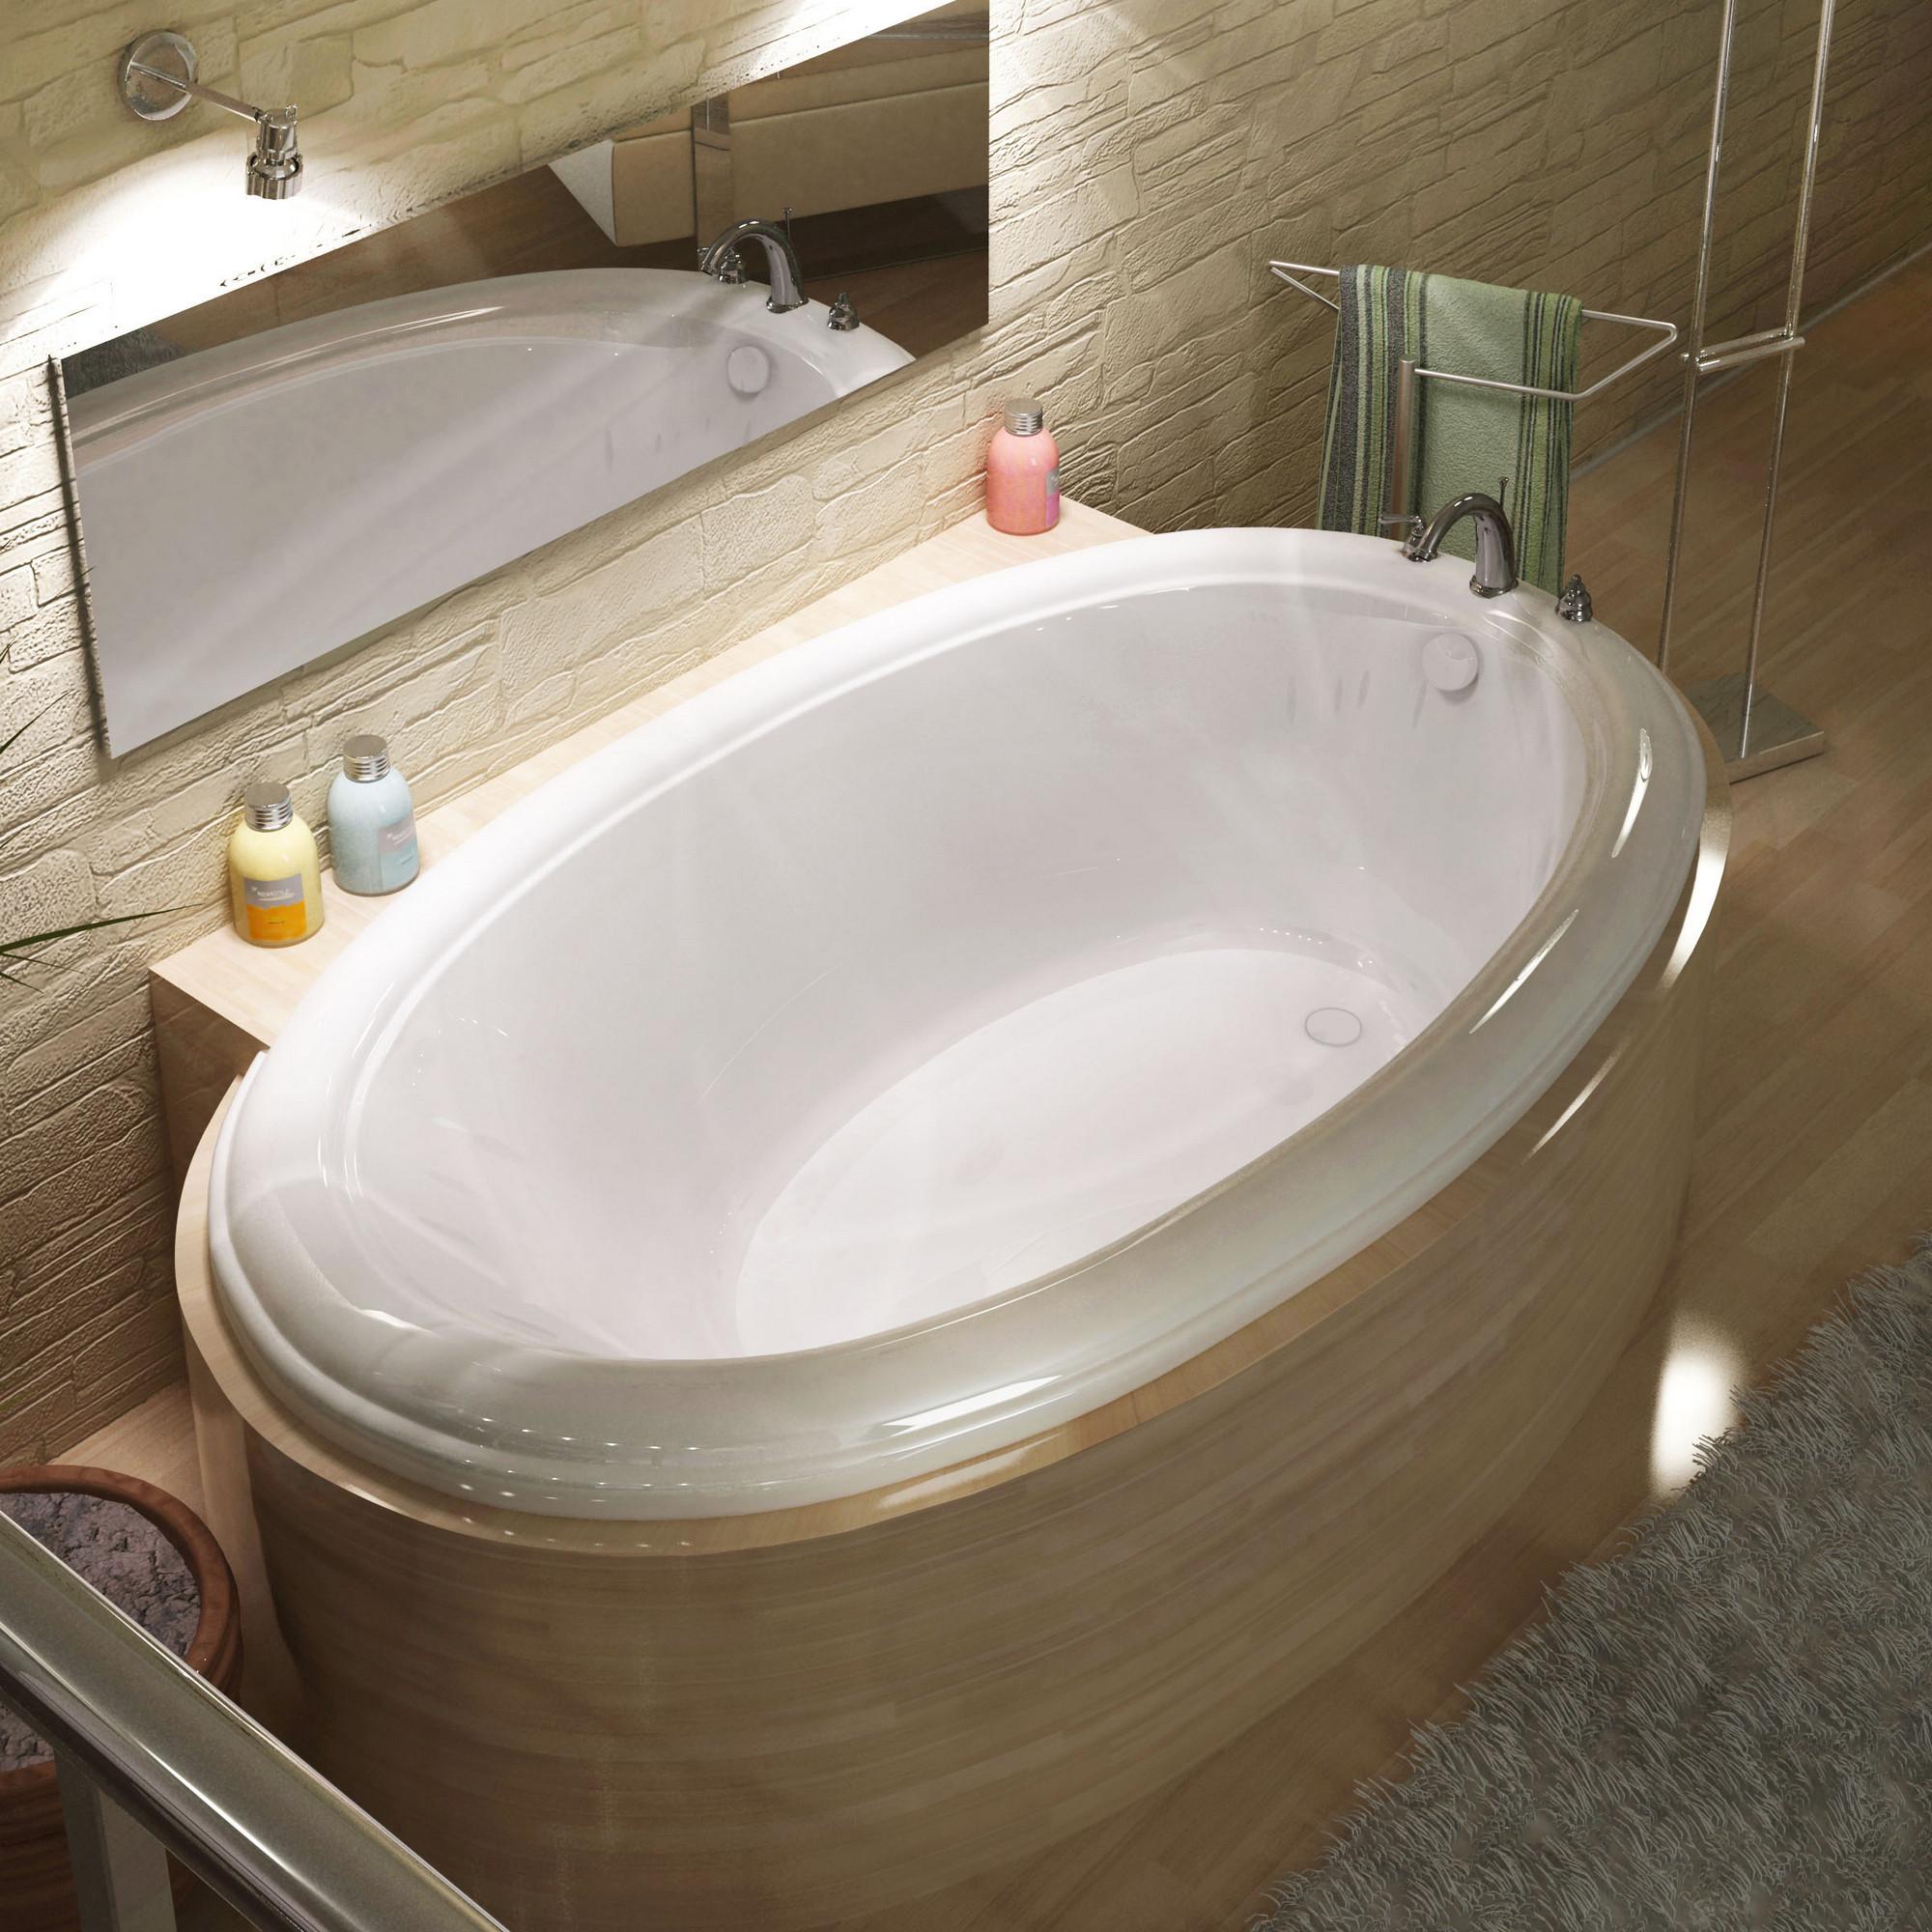 MediTub 4270P Atlantis Petite Oval Soaking Bathtub With Reversible Drain